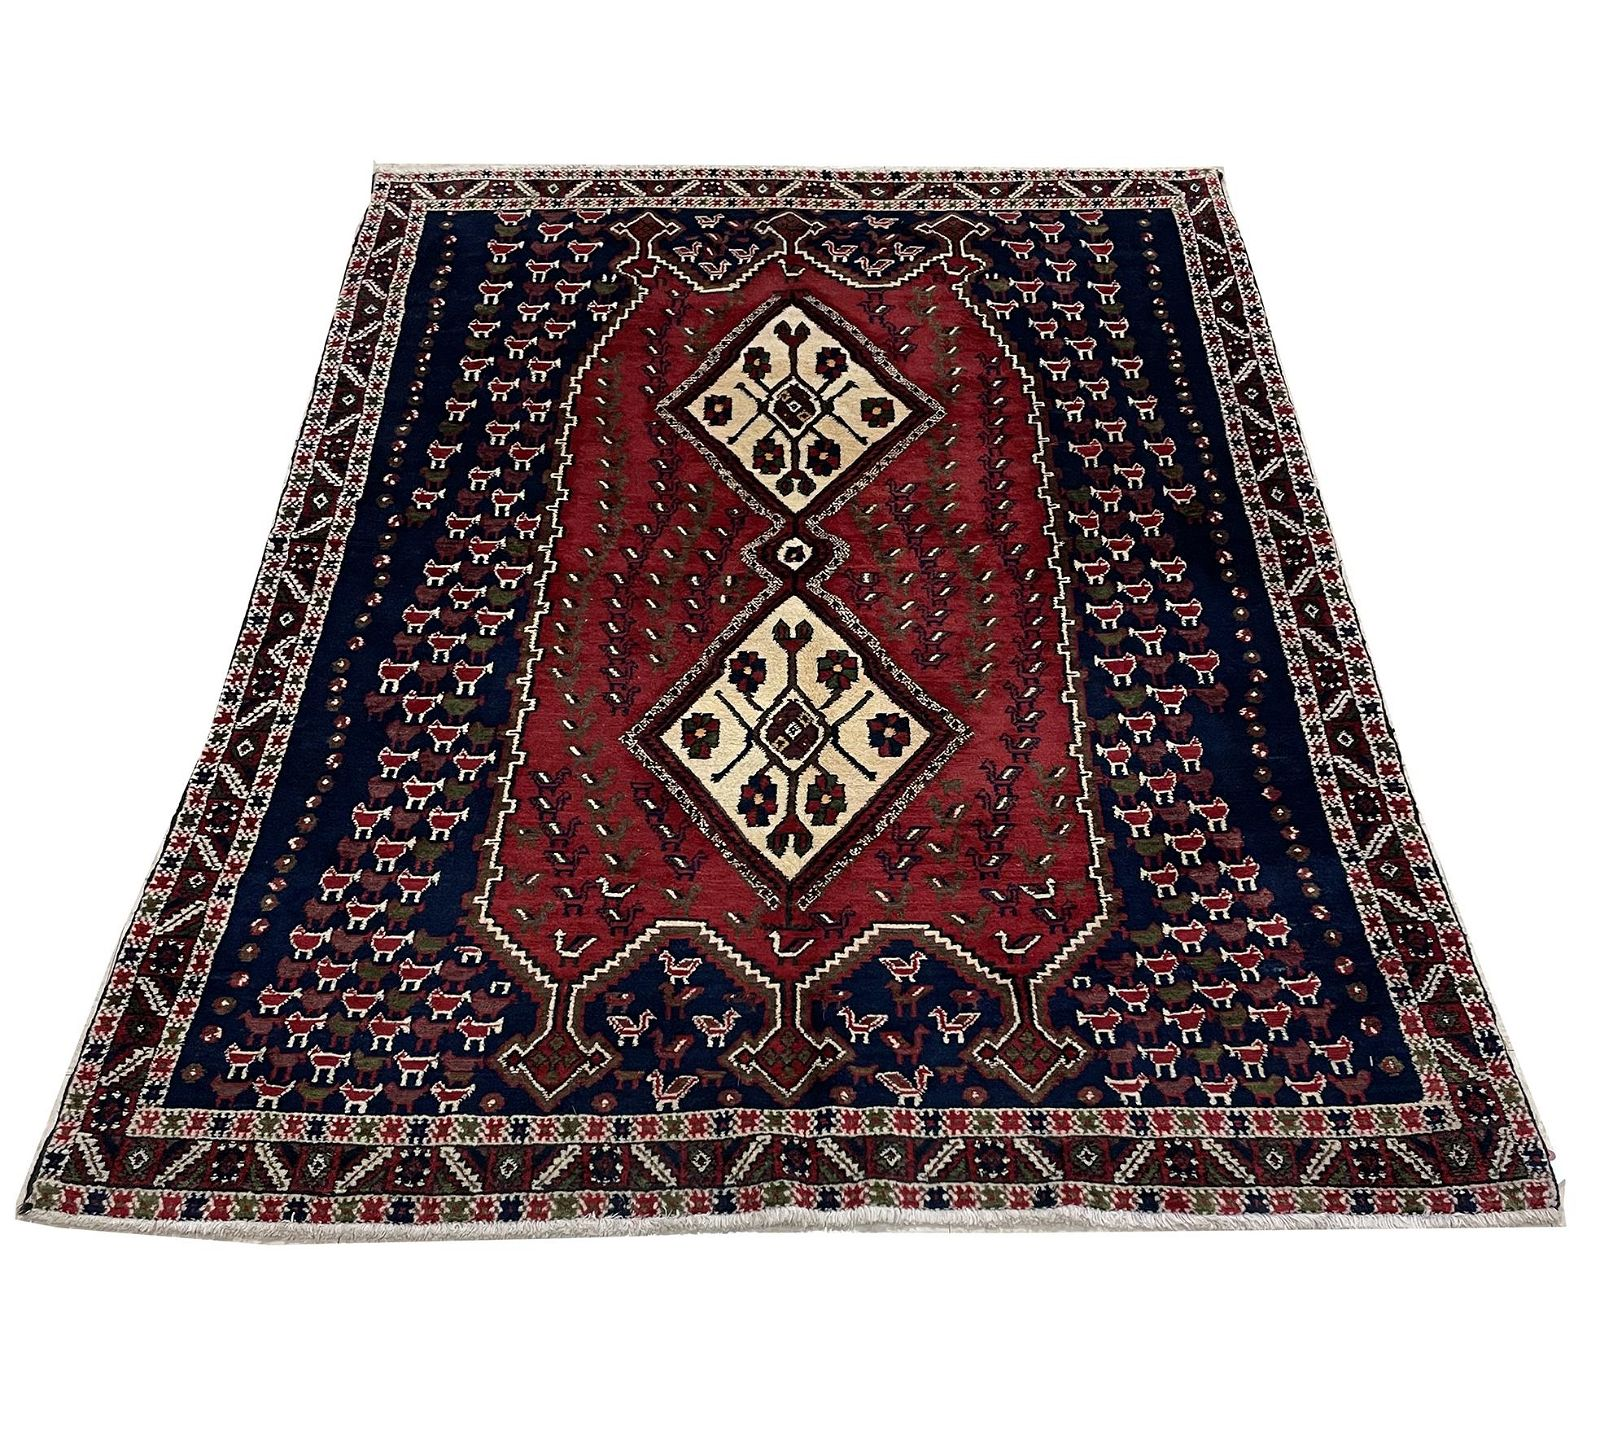 afshar 321-1530 style rug wool pile vintage hand